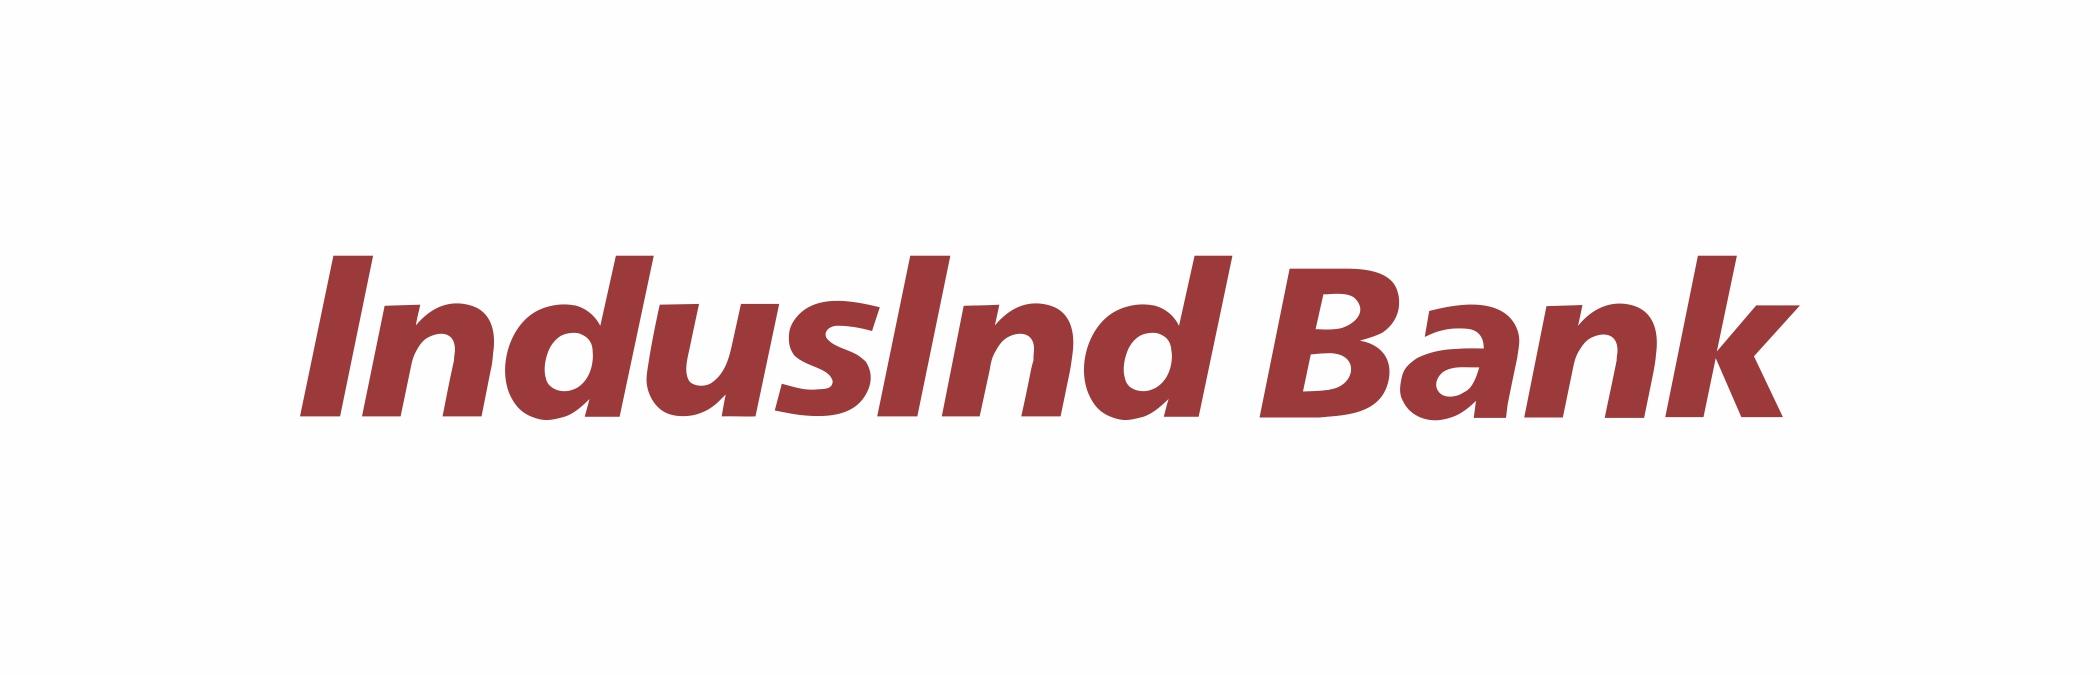 IndusInd Bank,CG ROAD